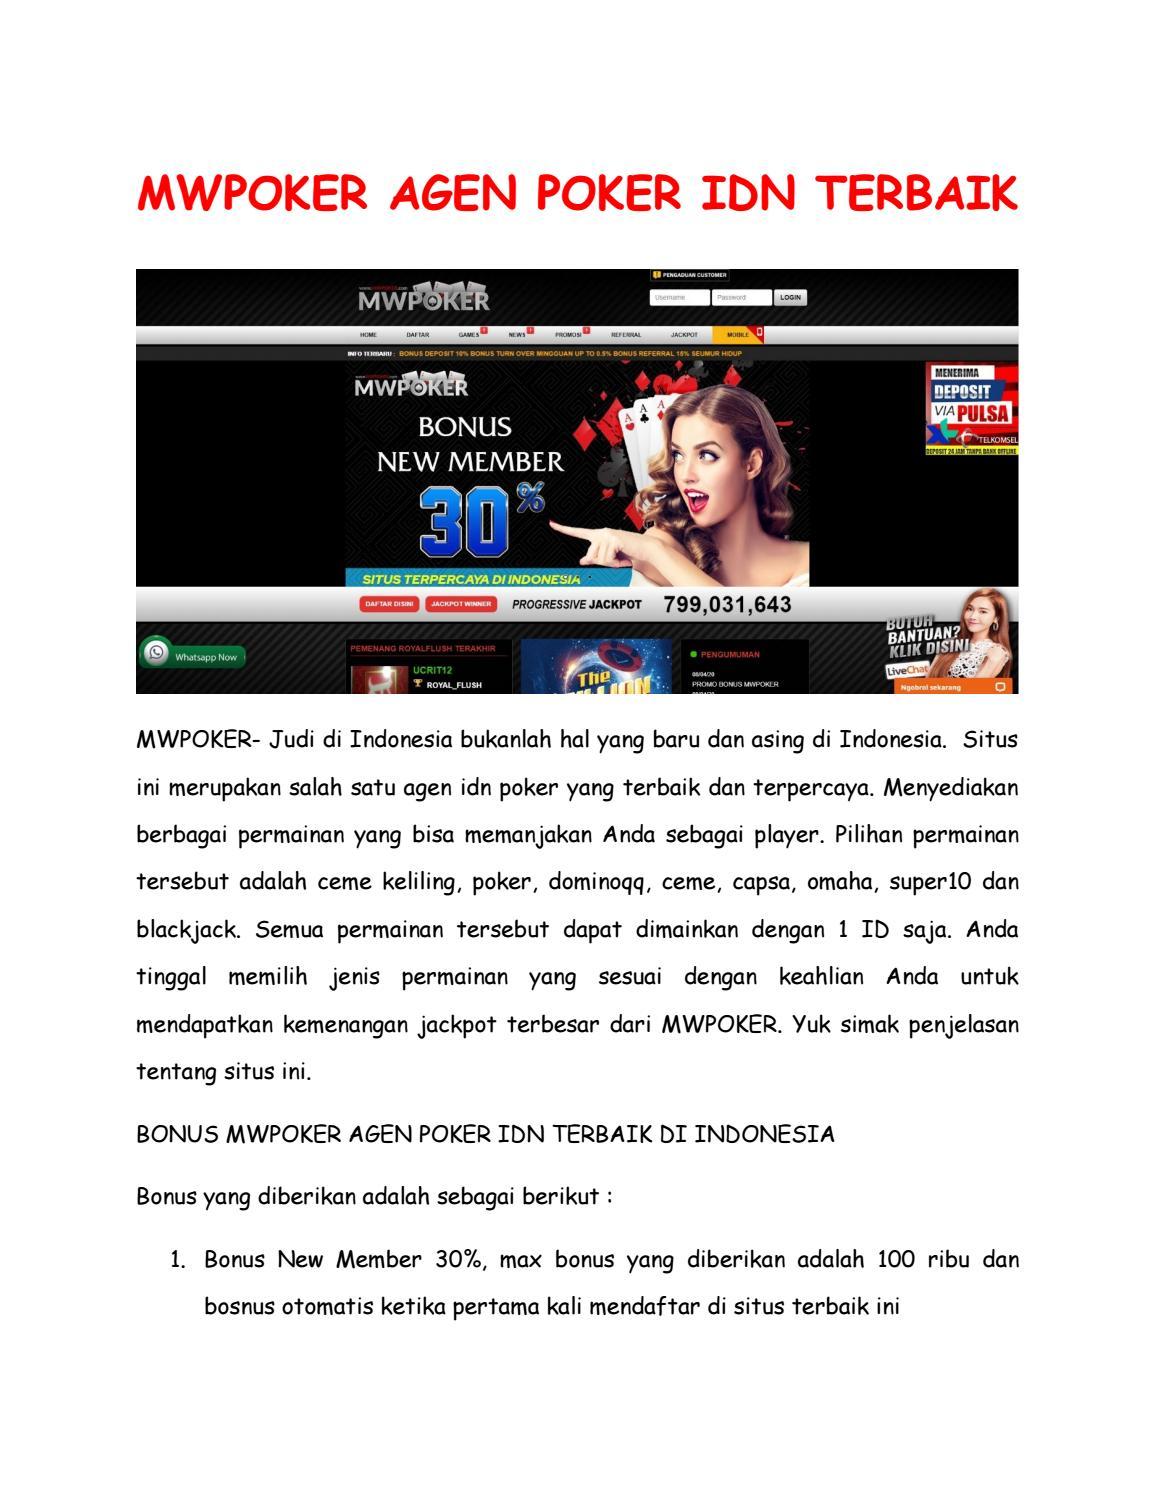 Mwpoker Agen Poker Idn Terbaik By Gilapoker Issuu